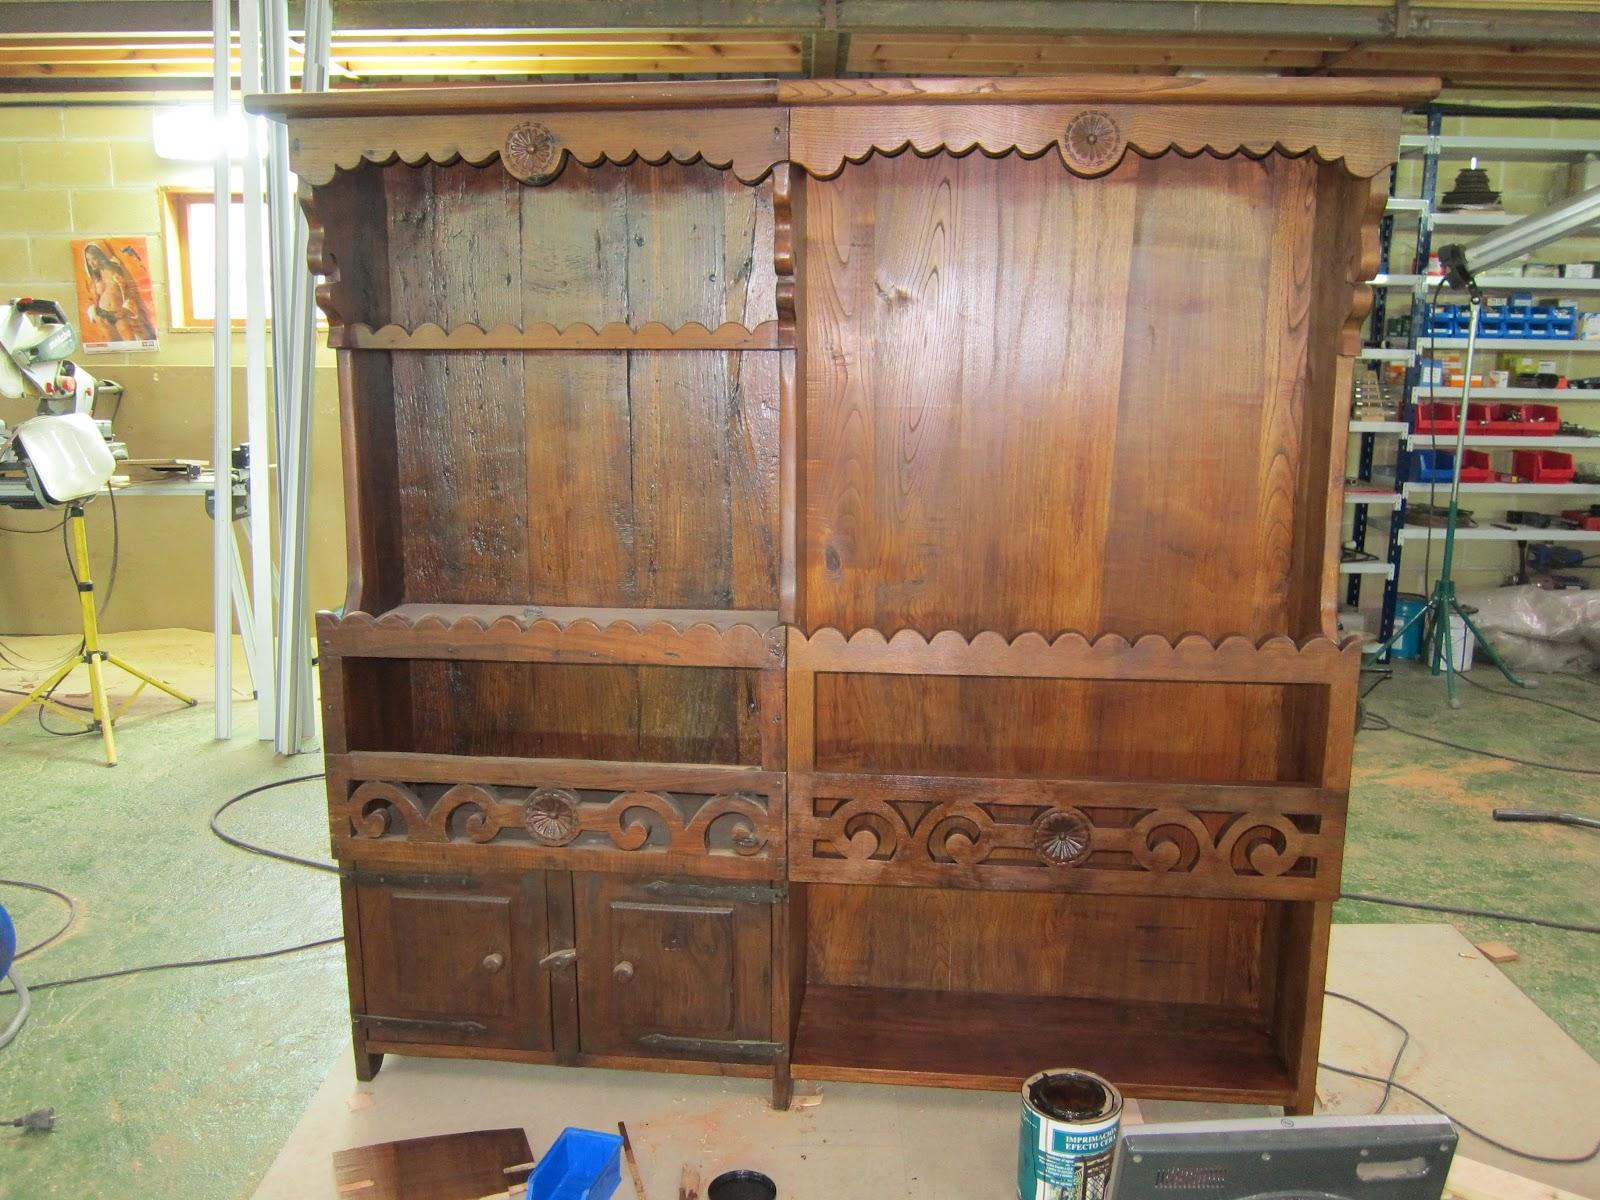 Carpinter a y toneler a como aprobechar un mueble viejo for Como restaurar un mueble viejo